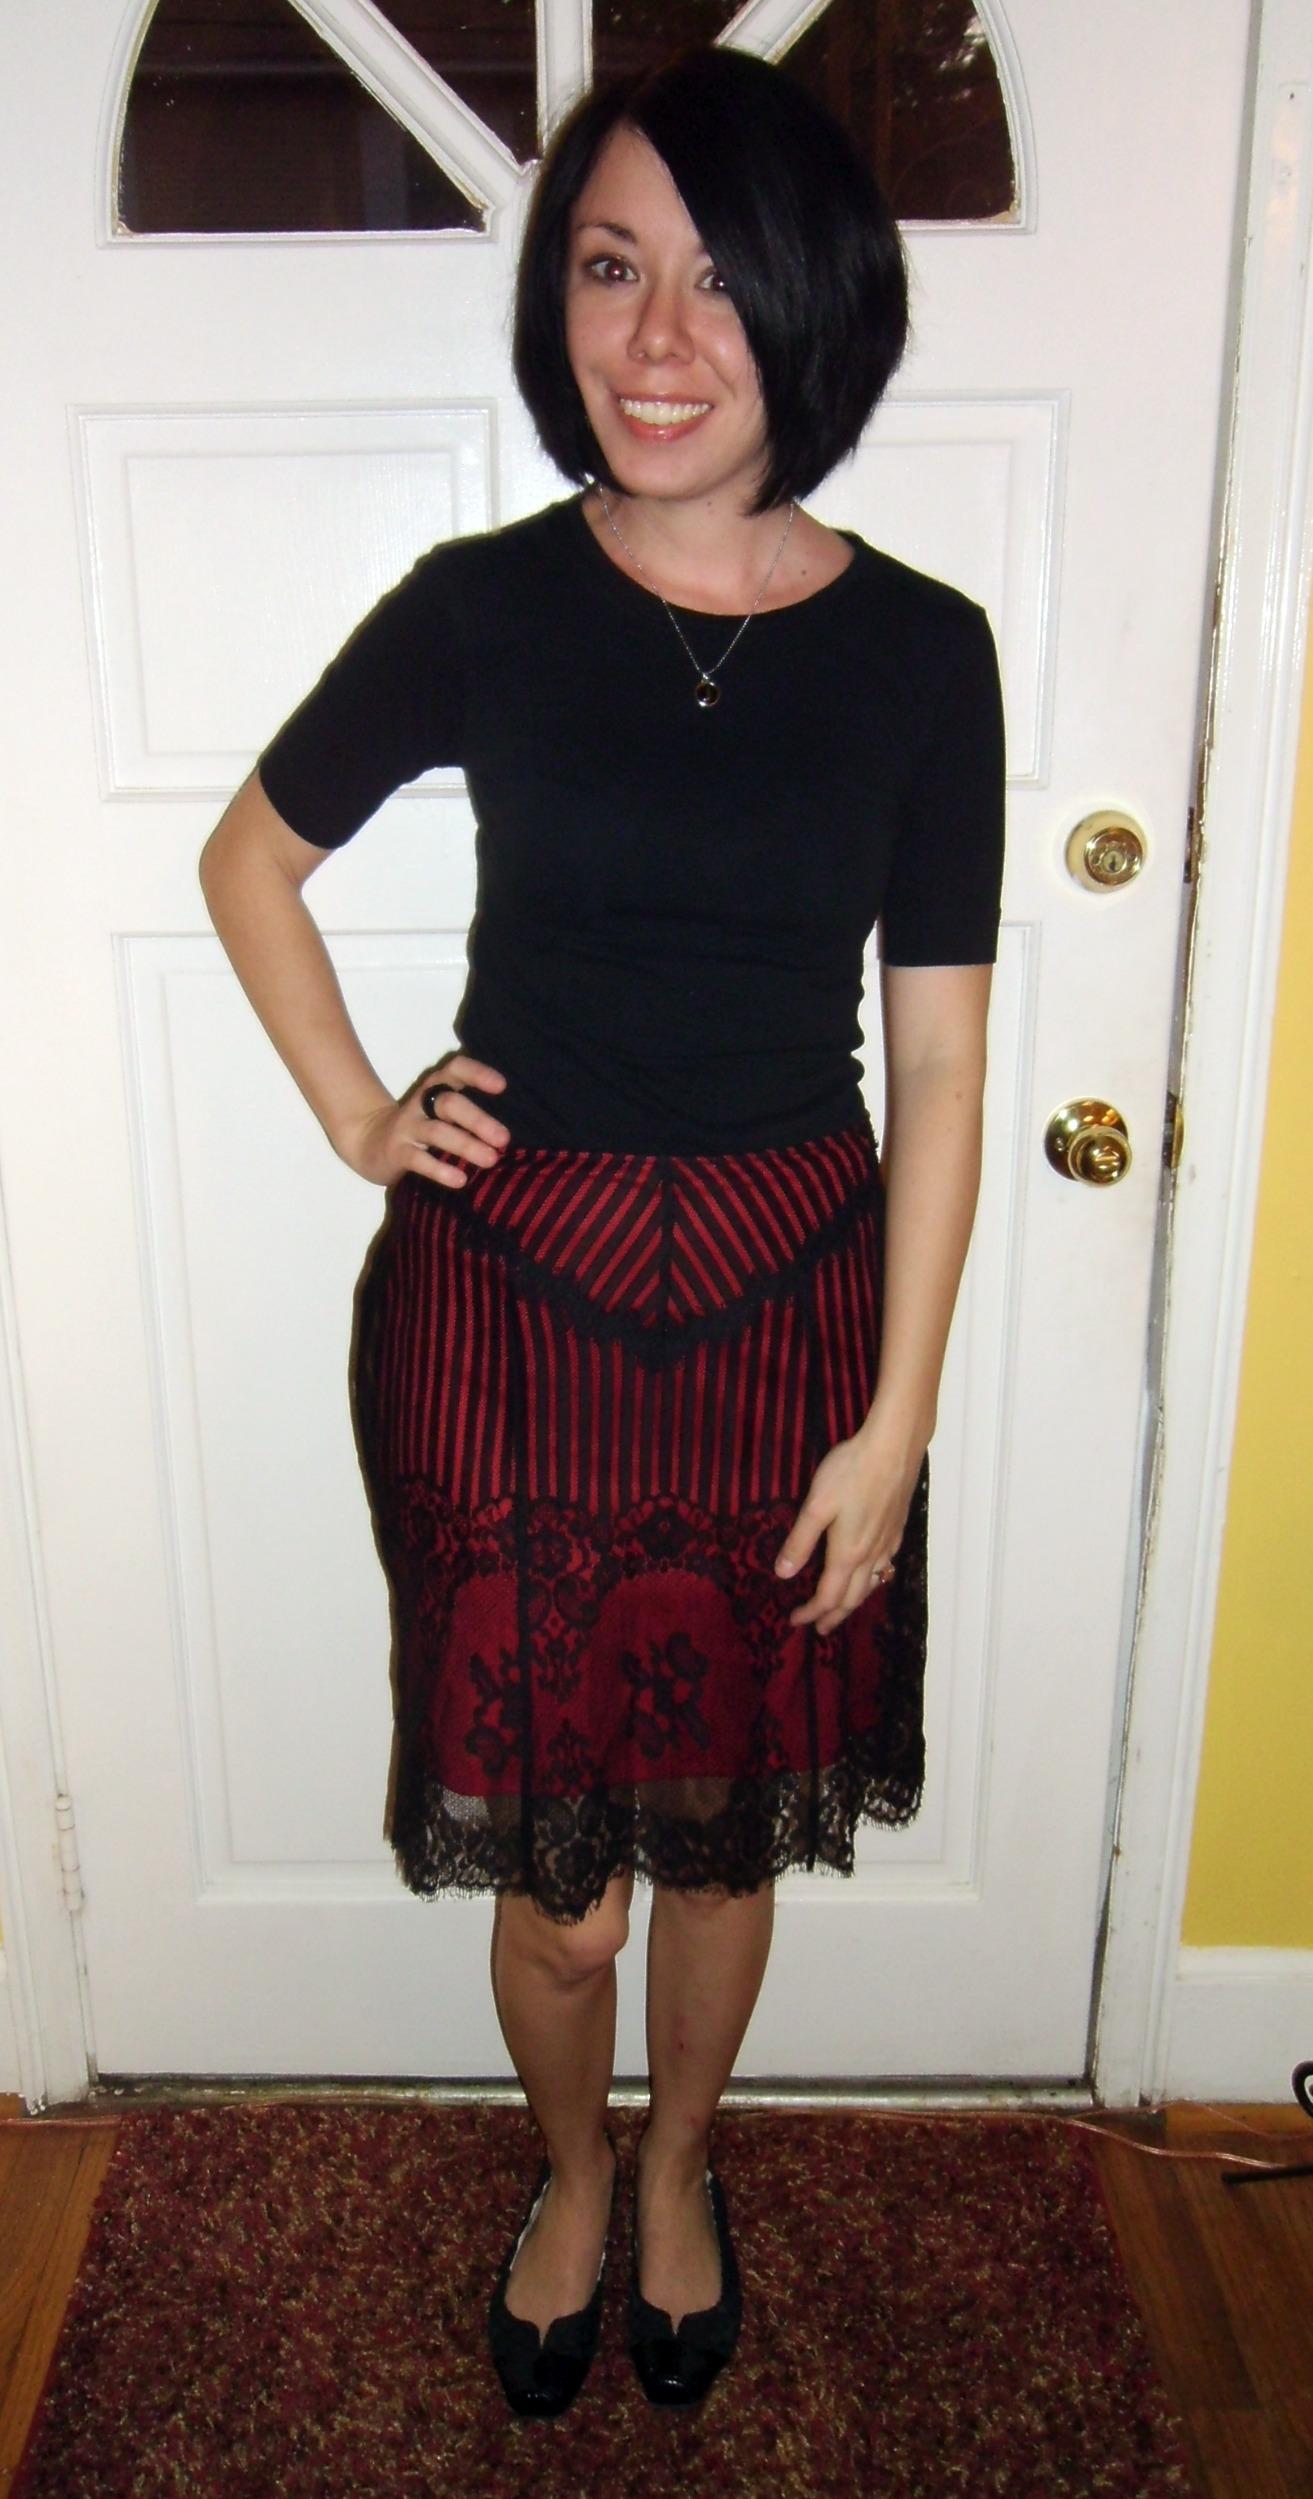 Day 125: Skirt or Shirt? 2